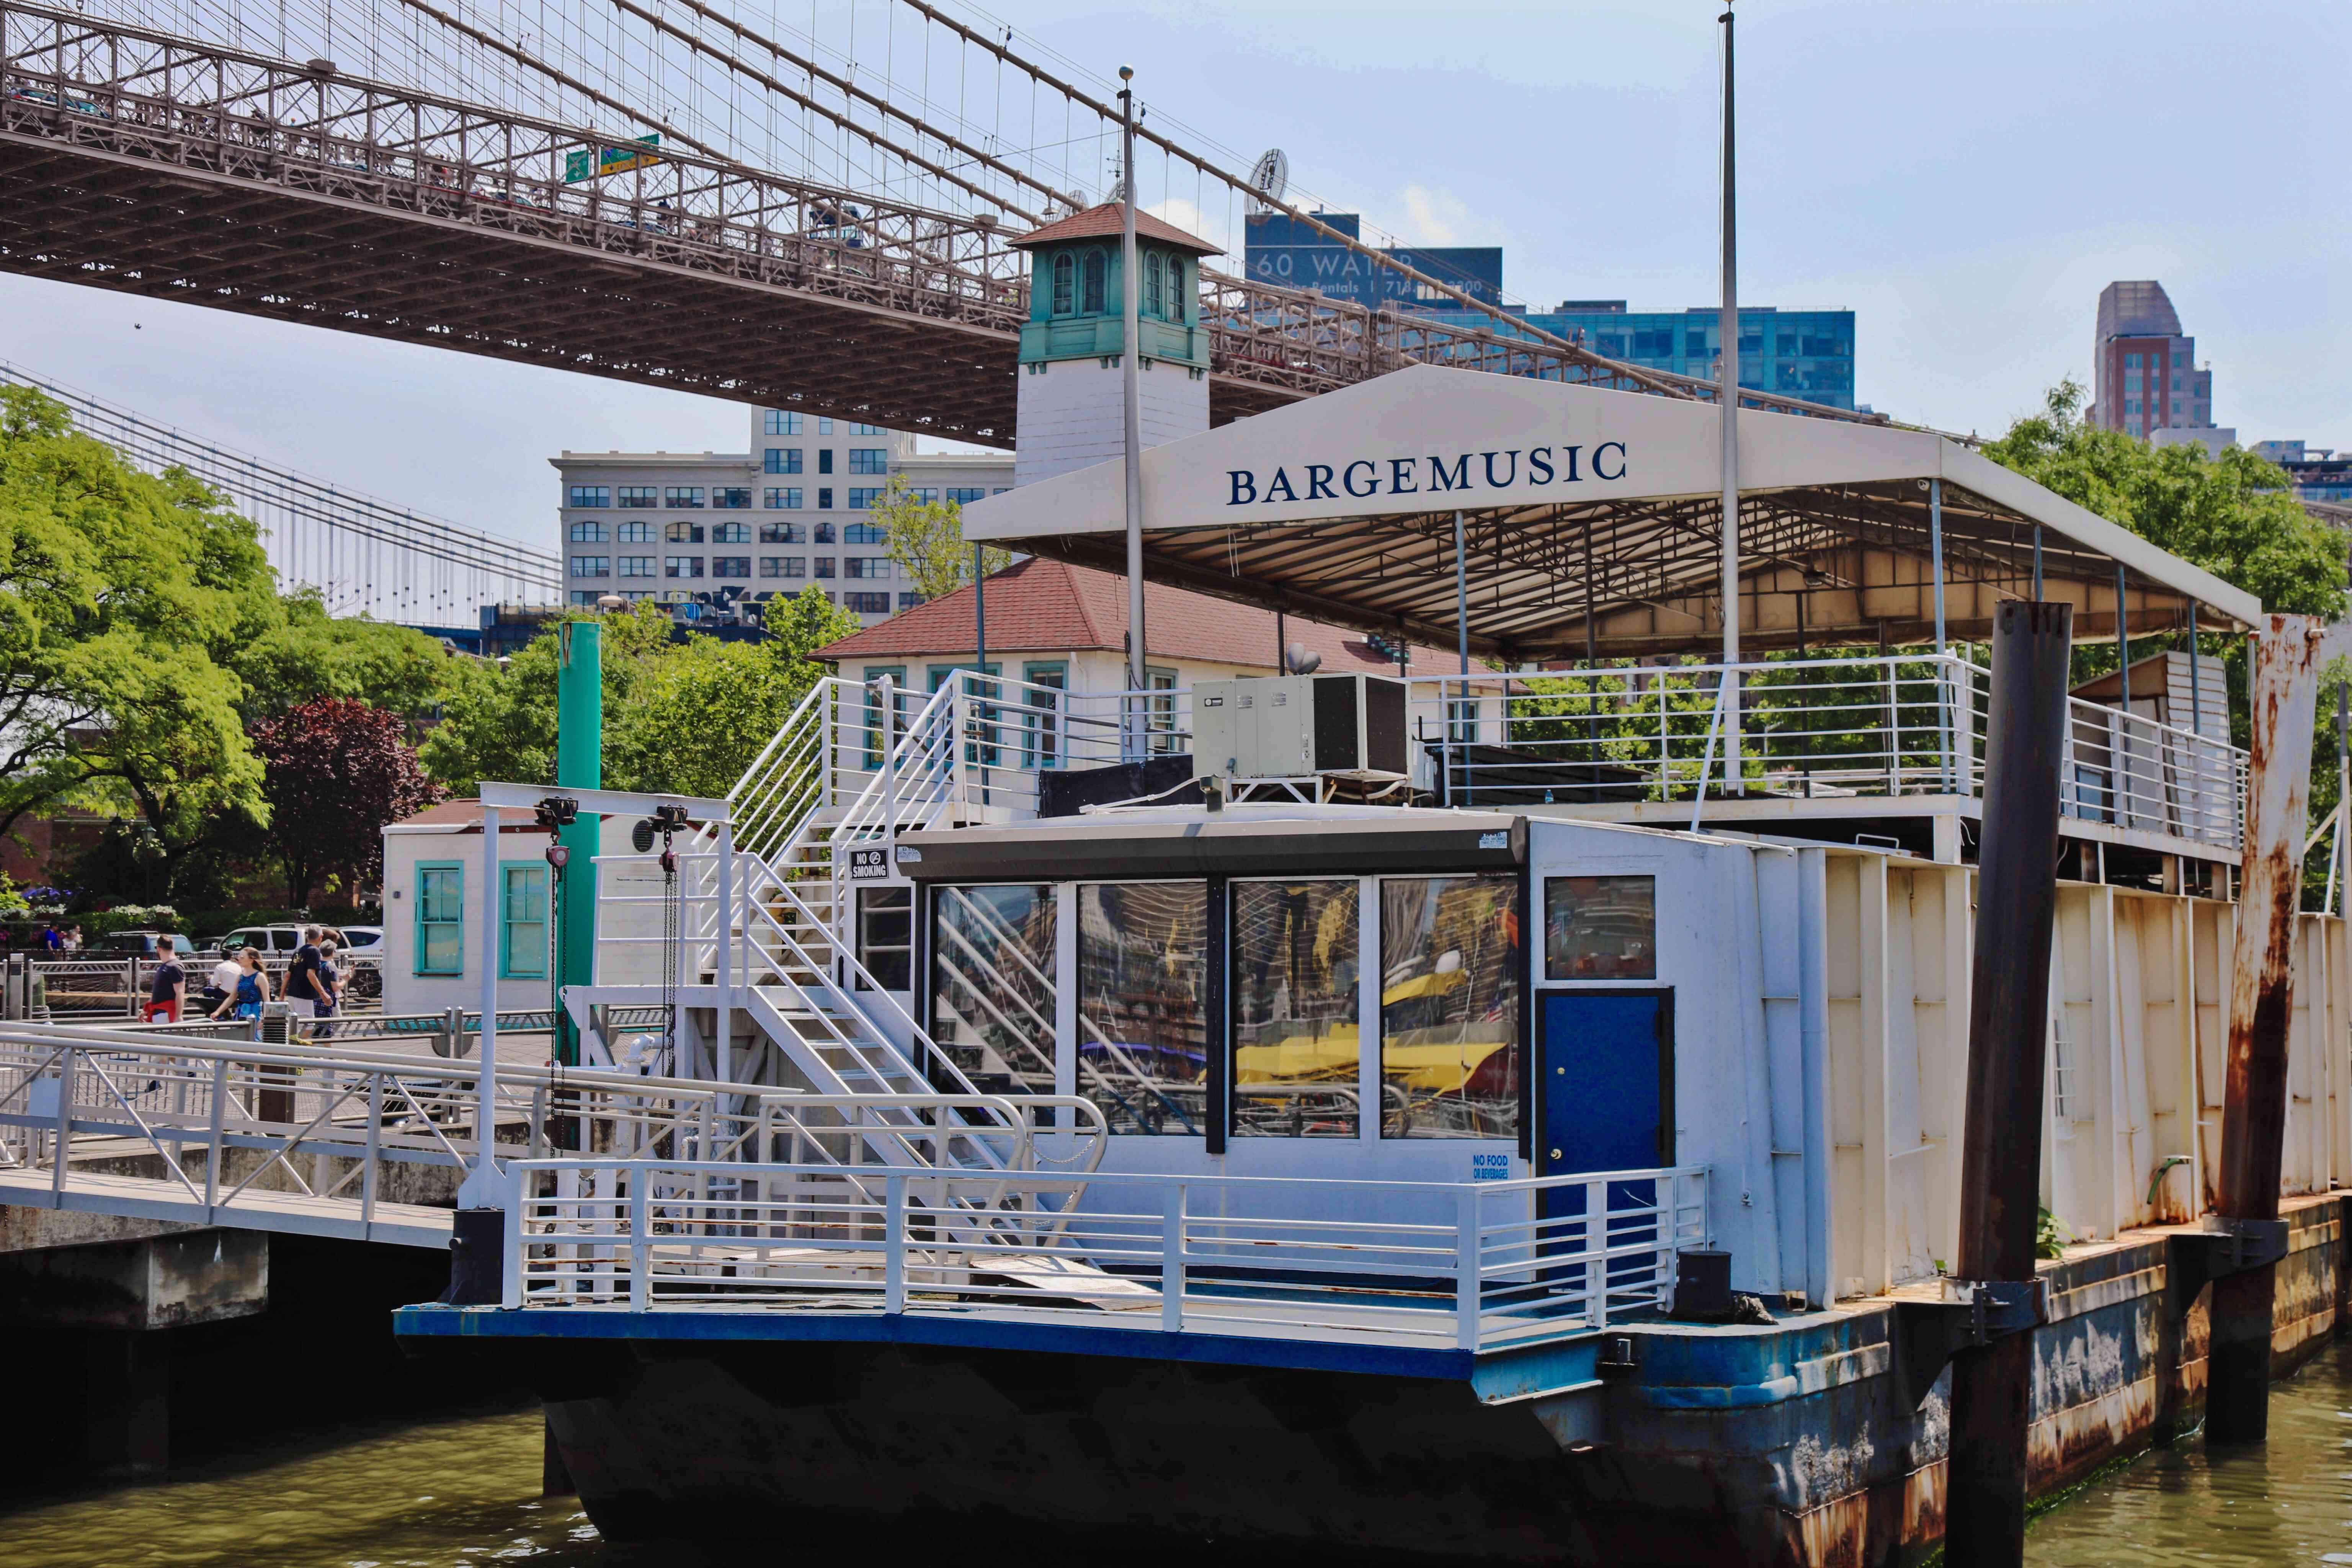 Barge Music venue